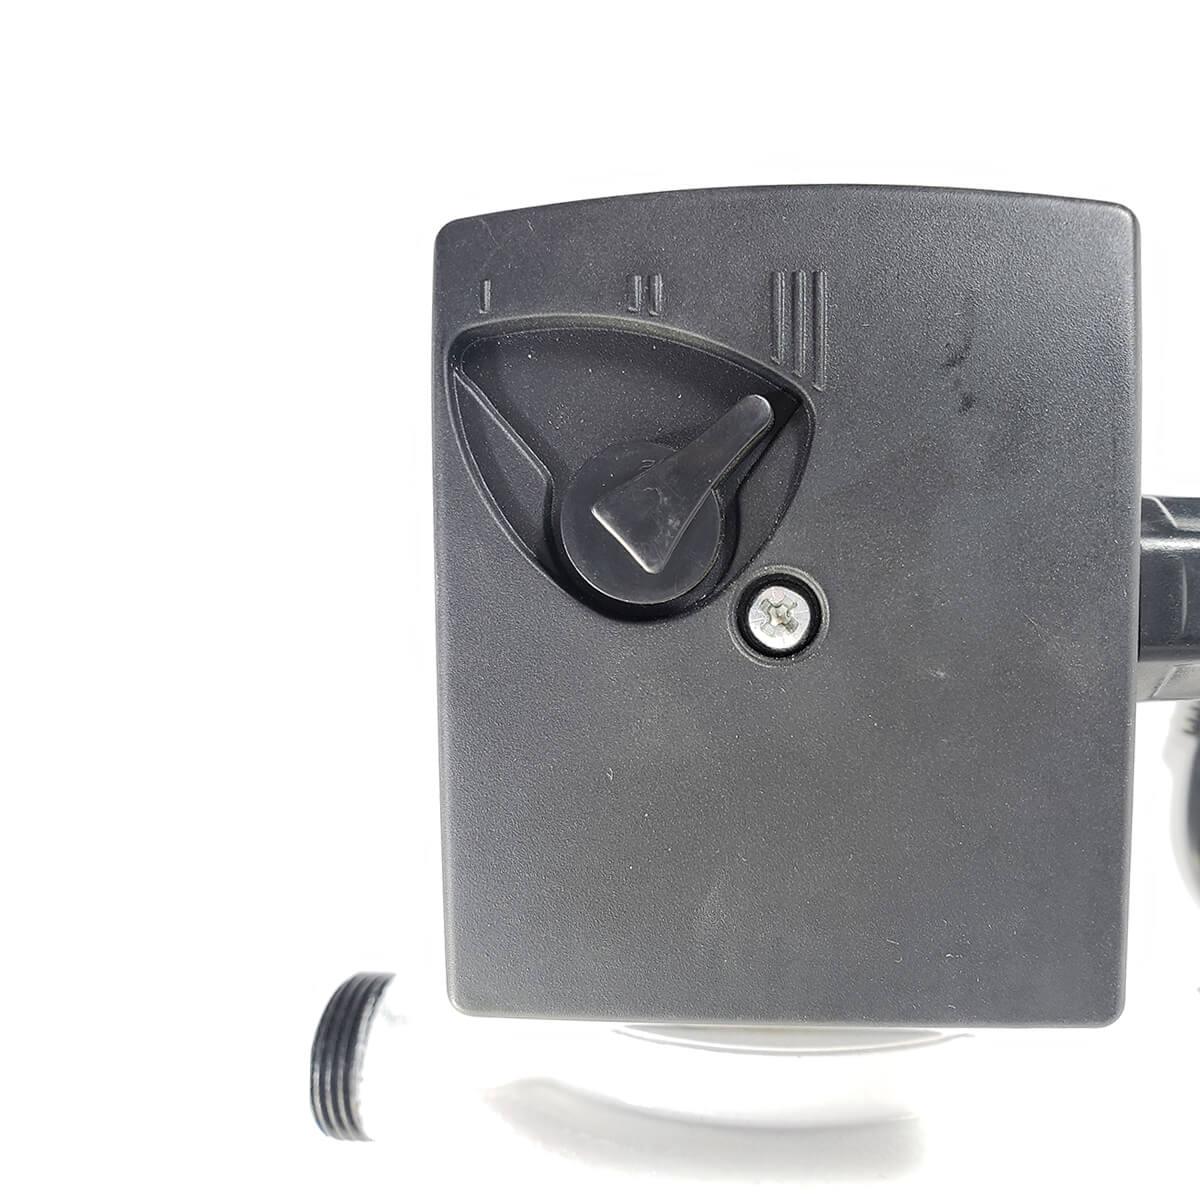 Bomba Pressurizadora De Água Masterlux 127V 15MCA 52L/M - 80000511